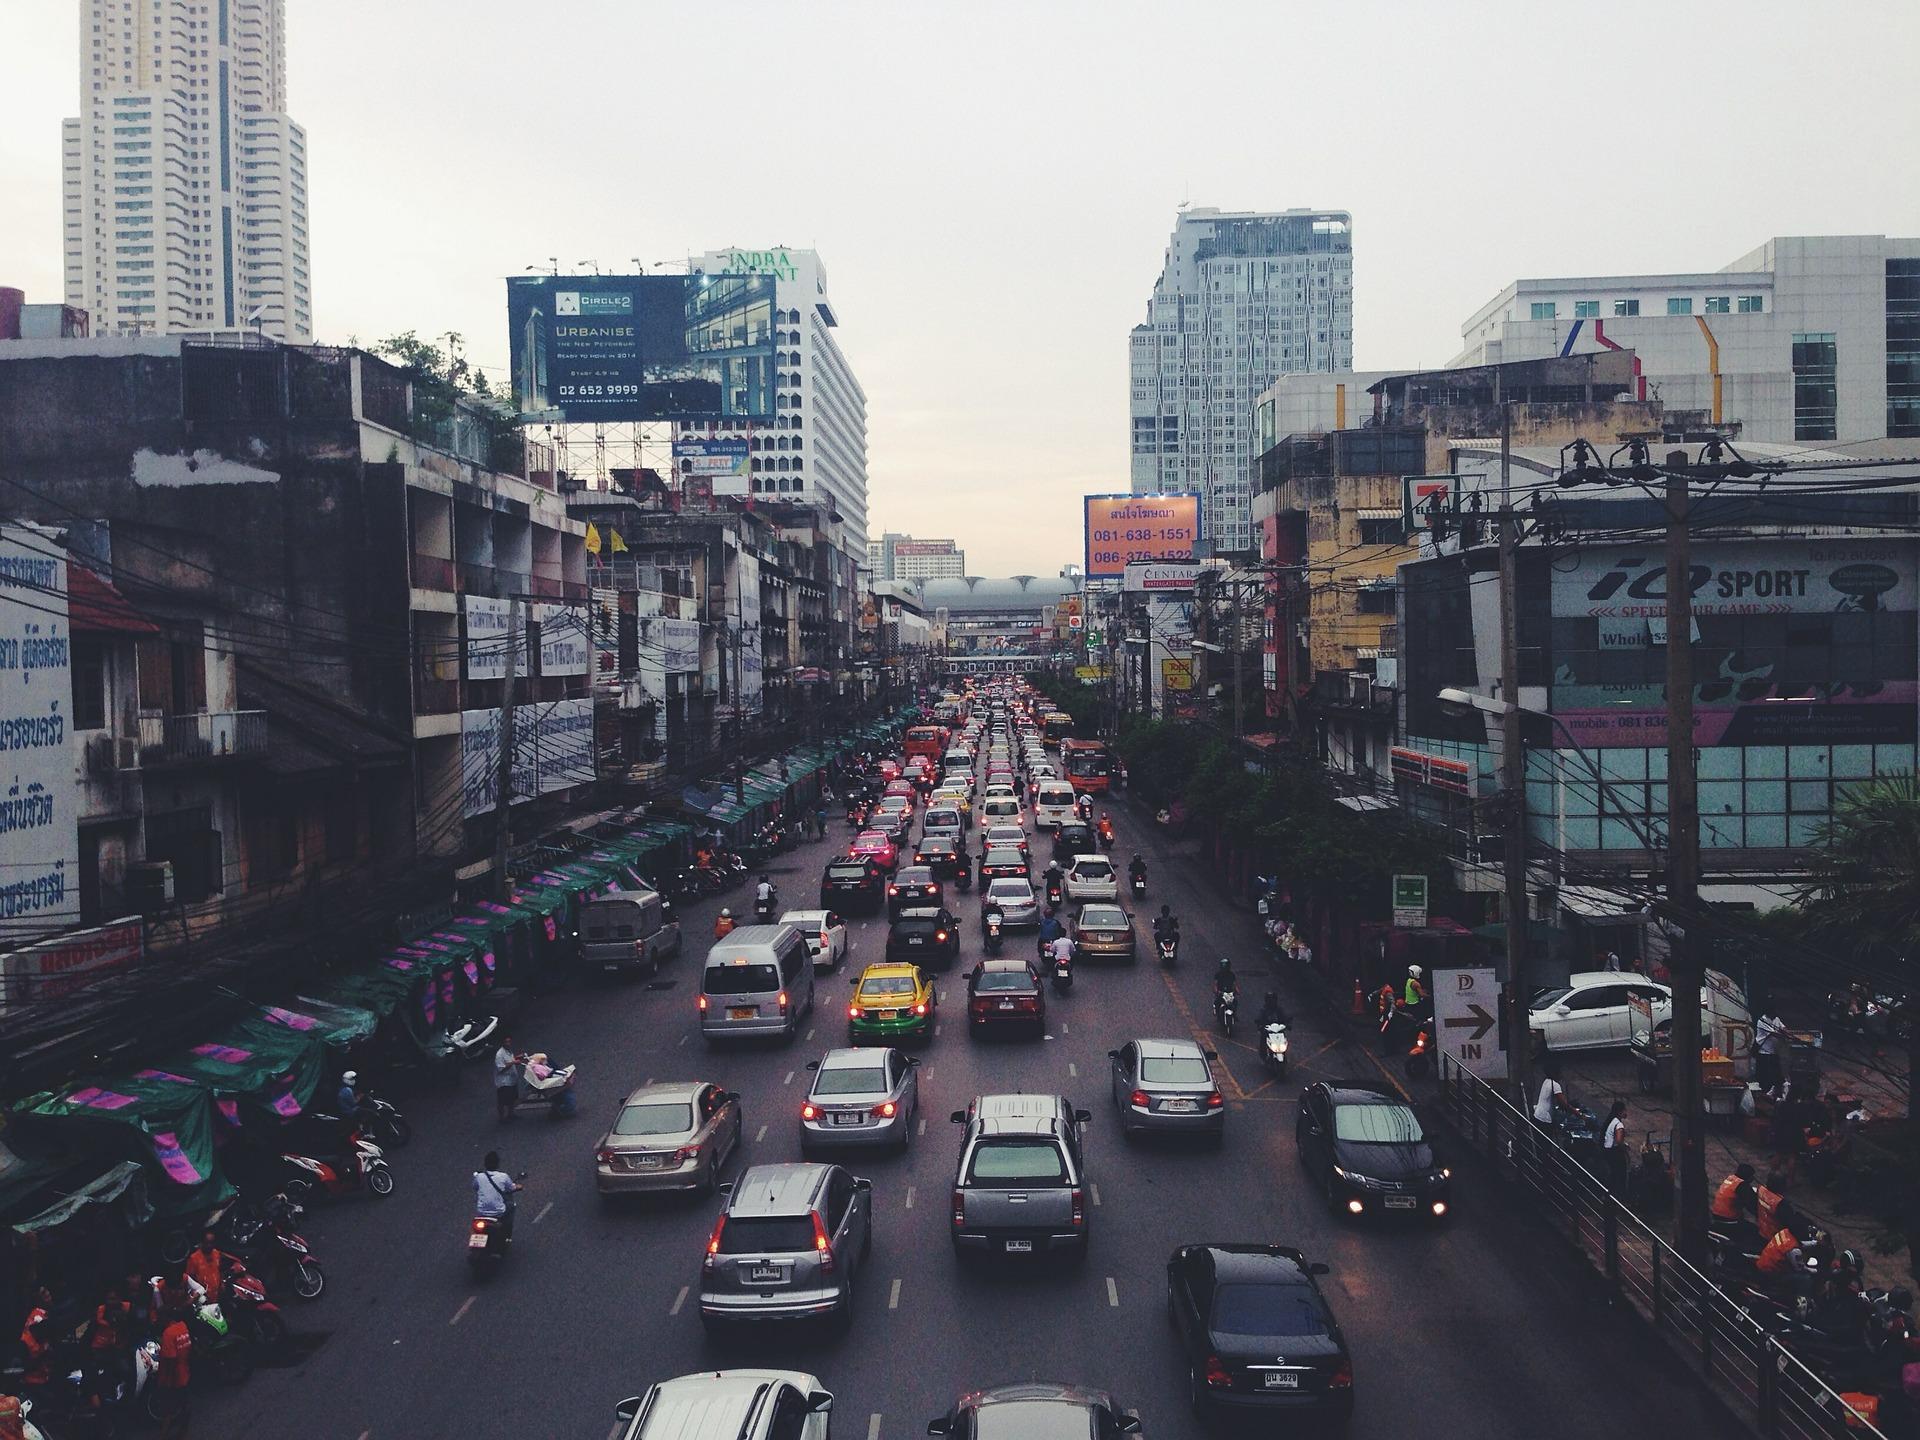 traffic-jam-388924_1920